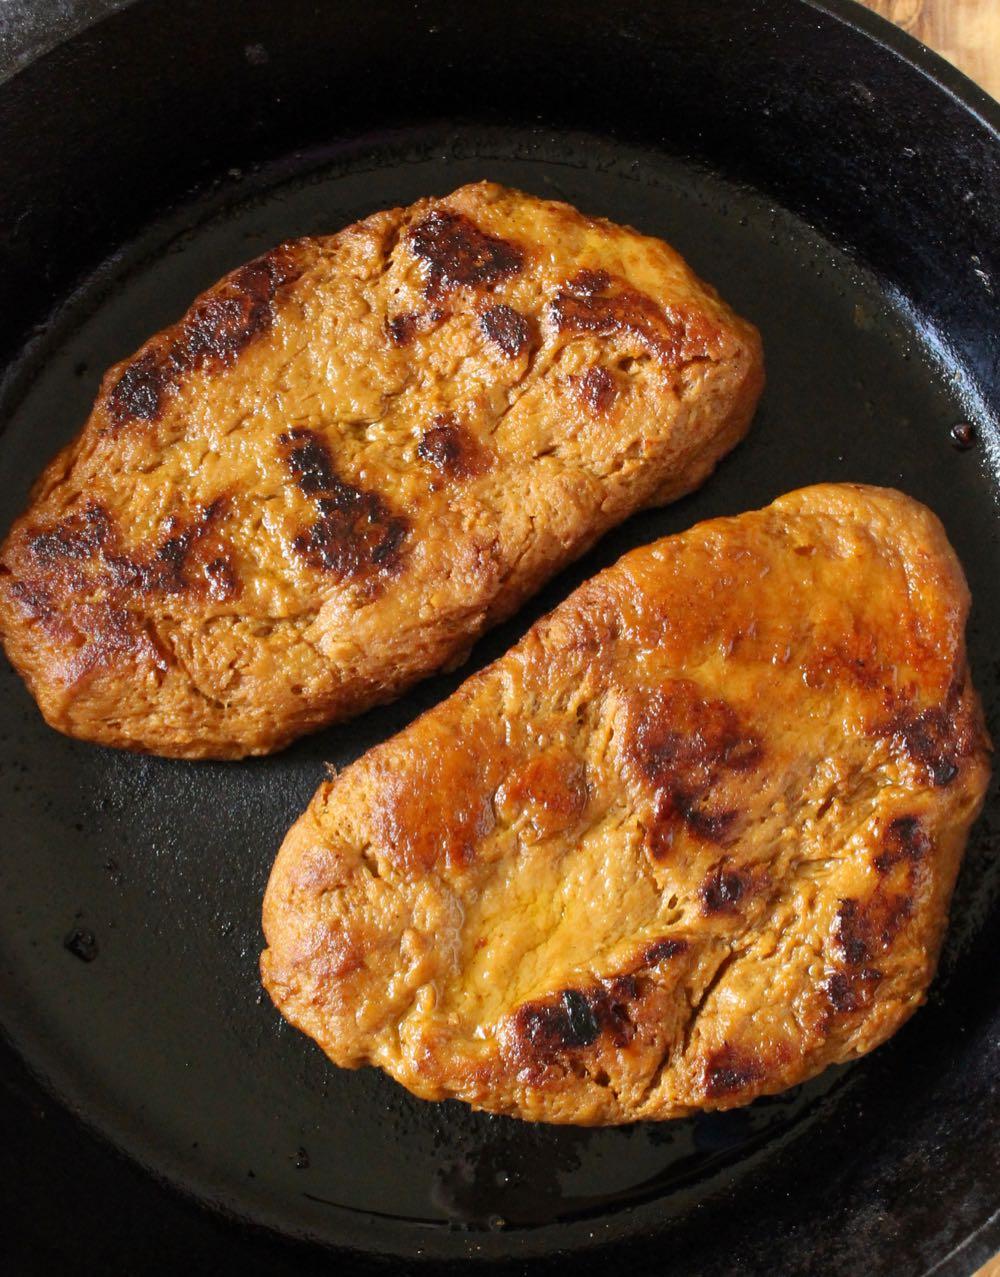 Pan seared vegan steak recipe in cast iron